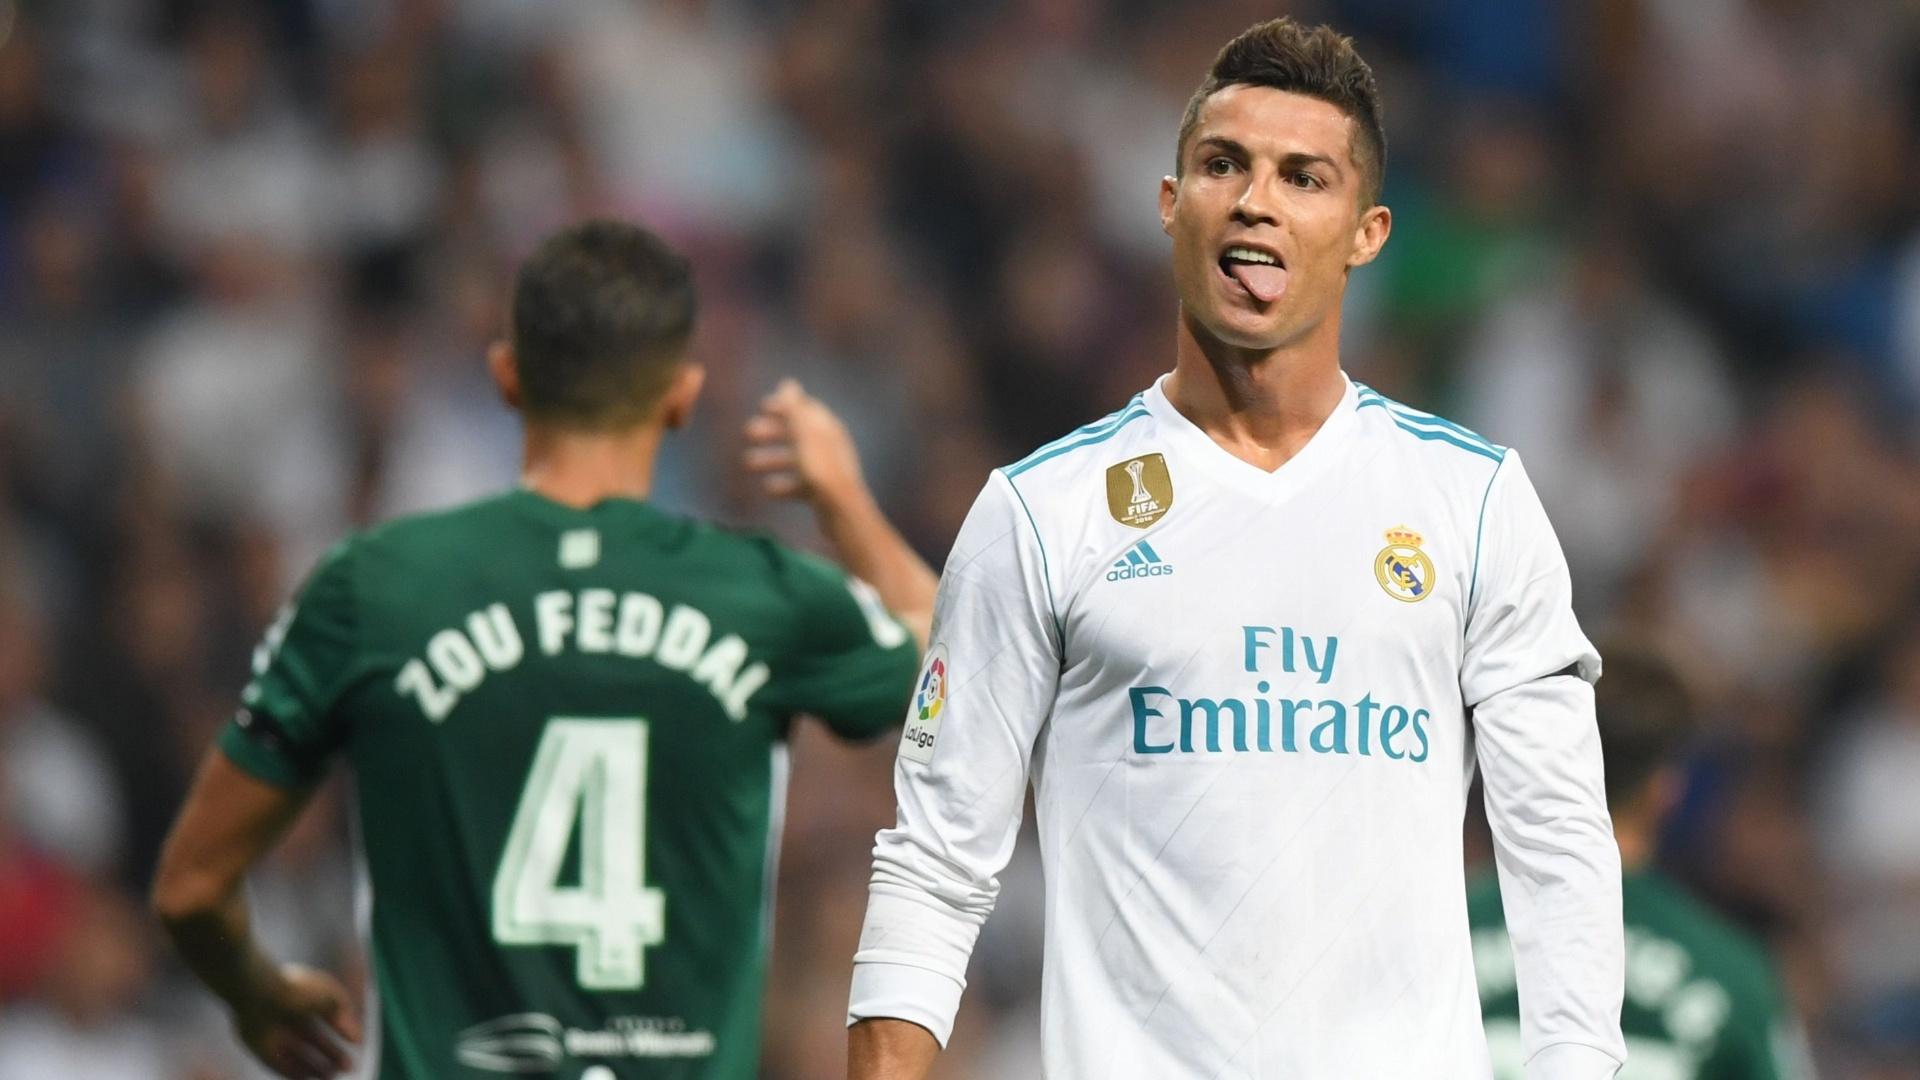 Cristiano Ronaldo gesticula durante a partida entre Real Madrid e Real Betis